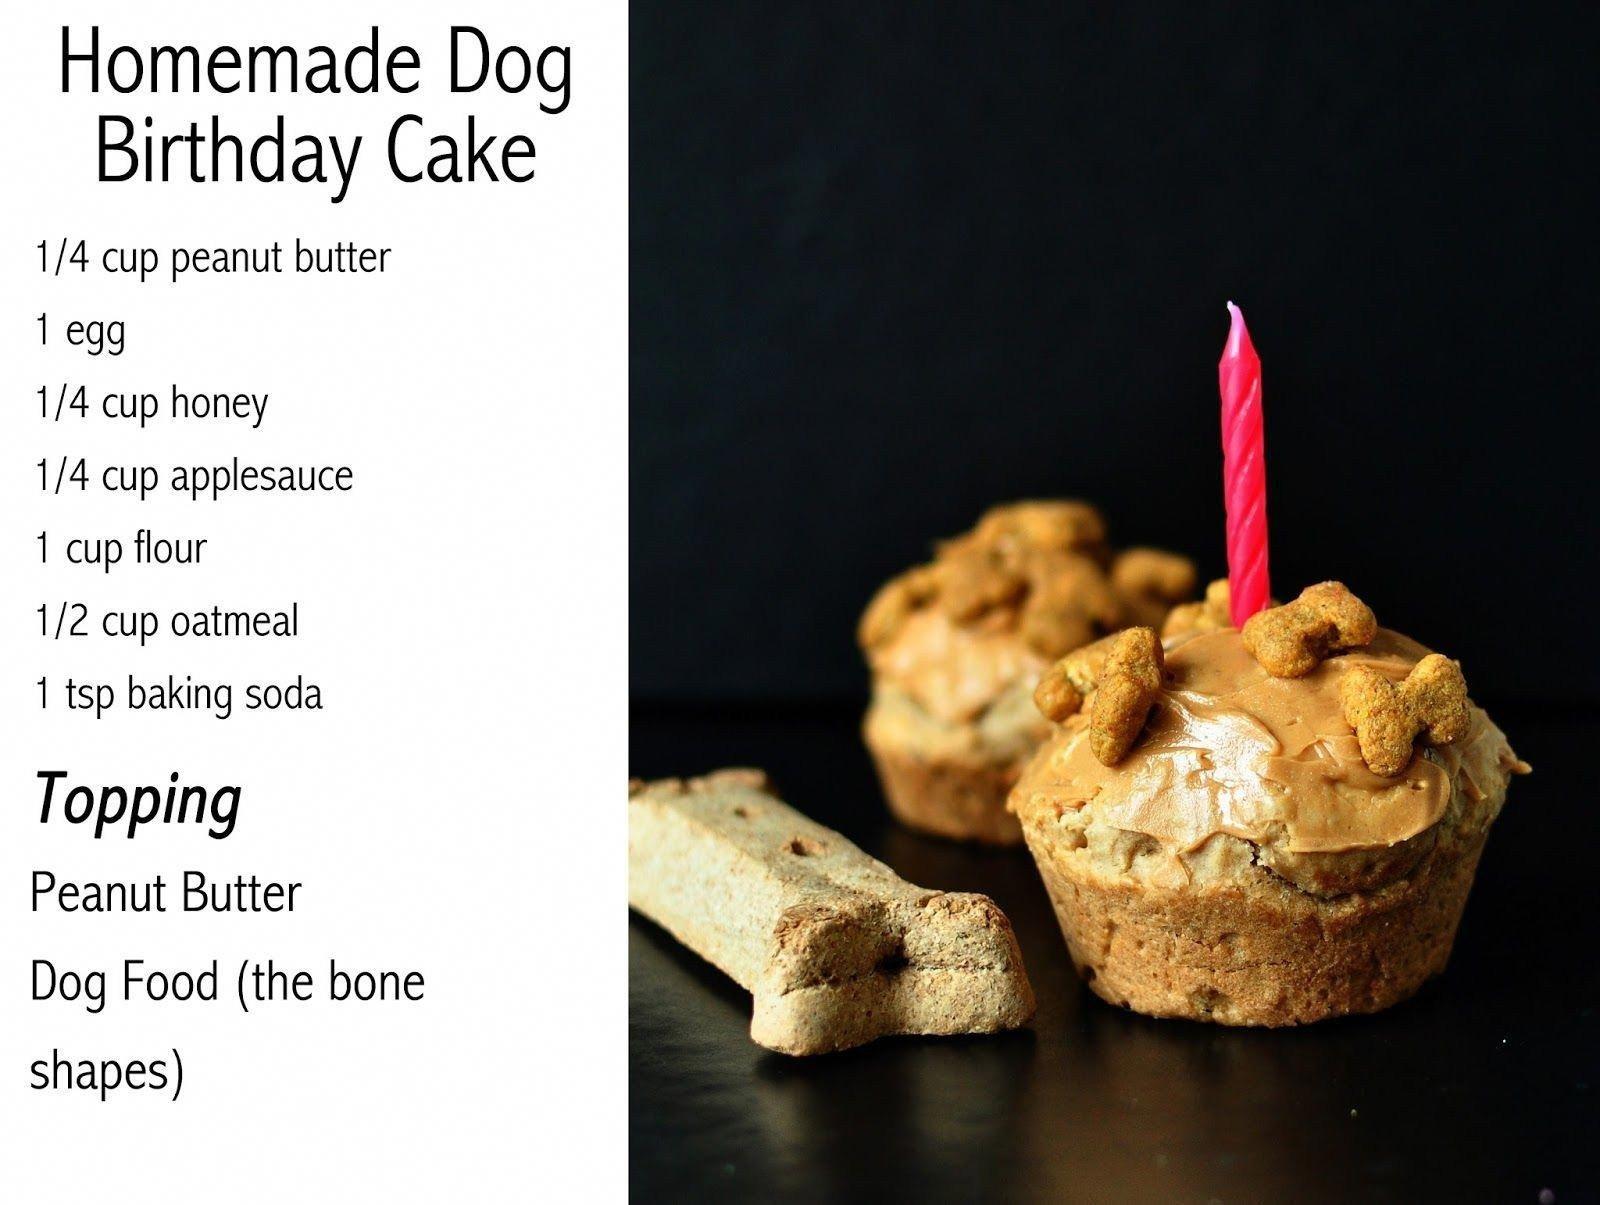 Dog birthday cake recipes easy dog homemade cupcakes or